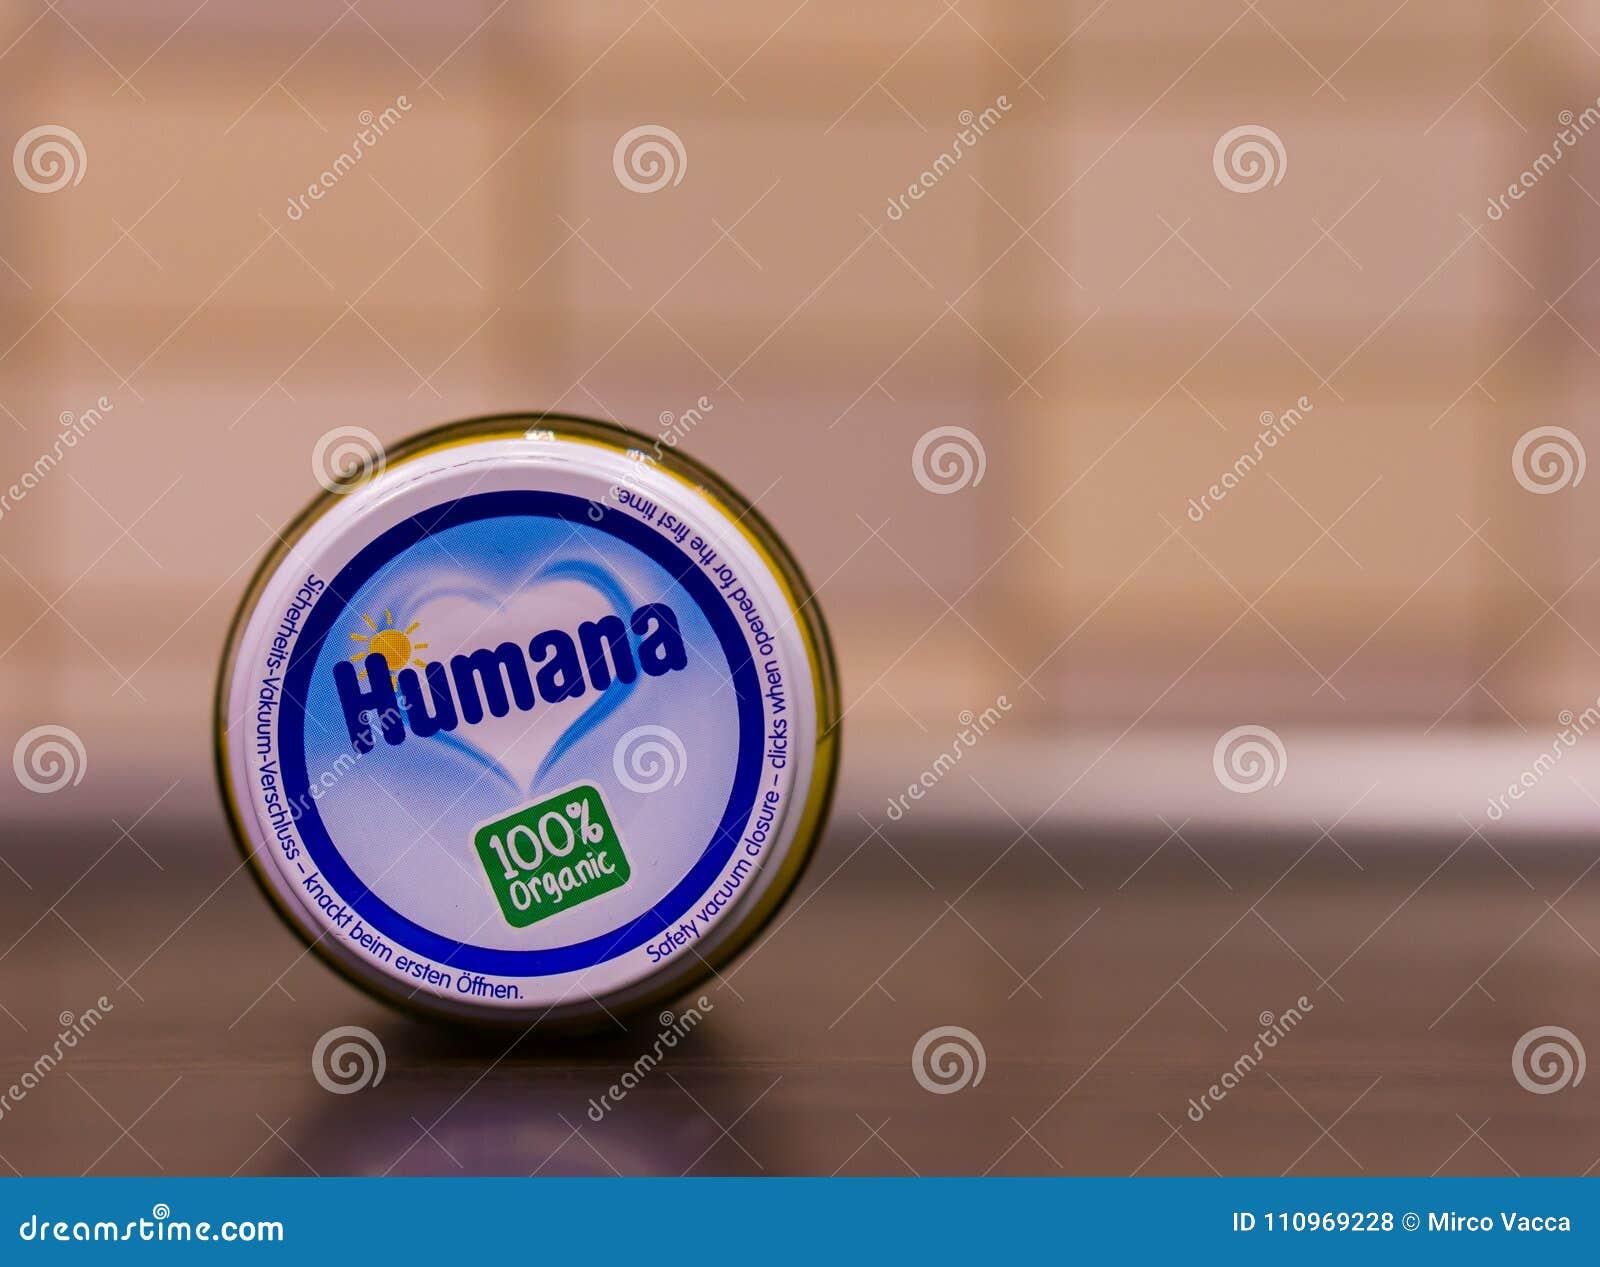 Humana organic baby food